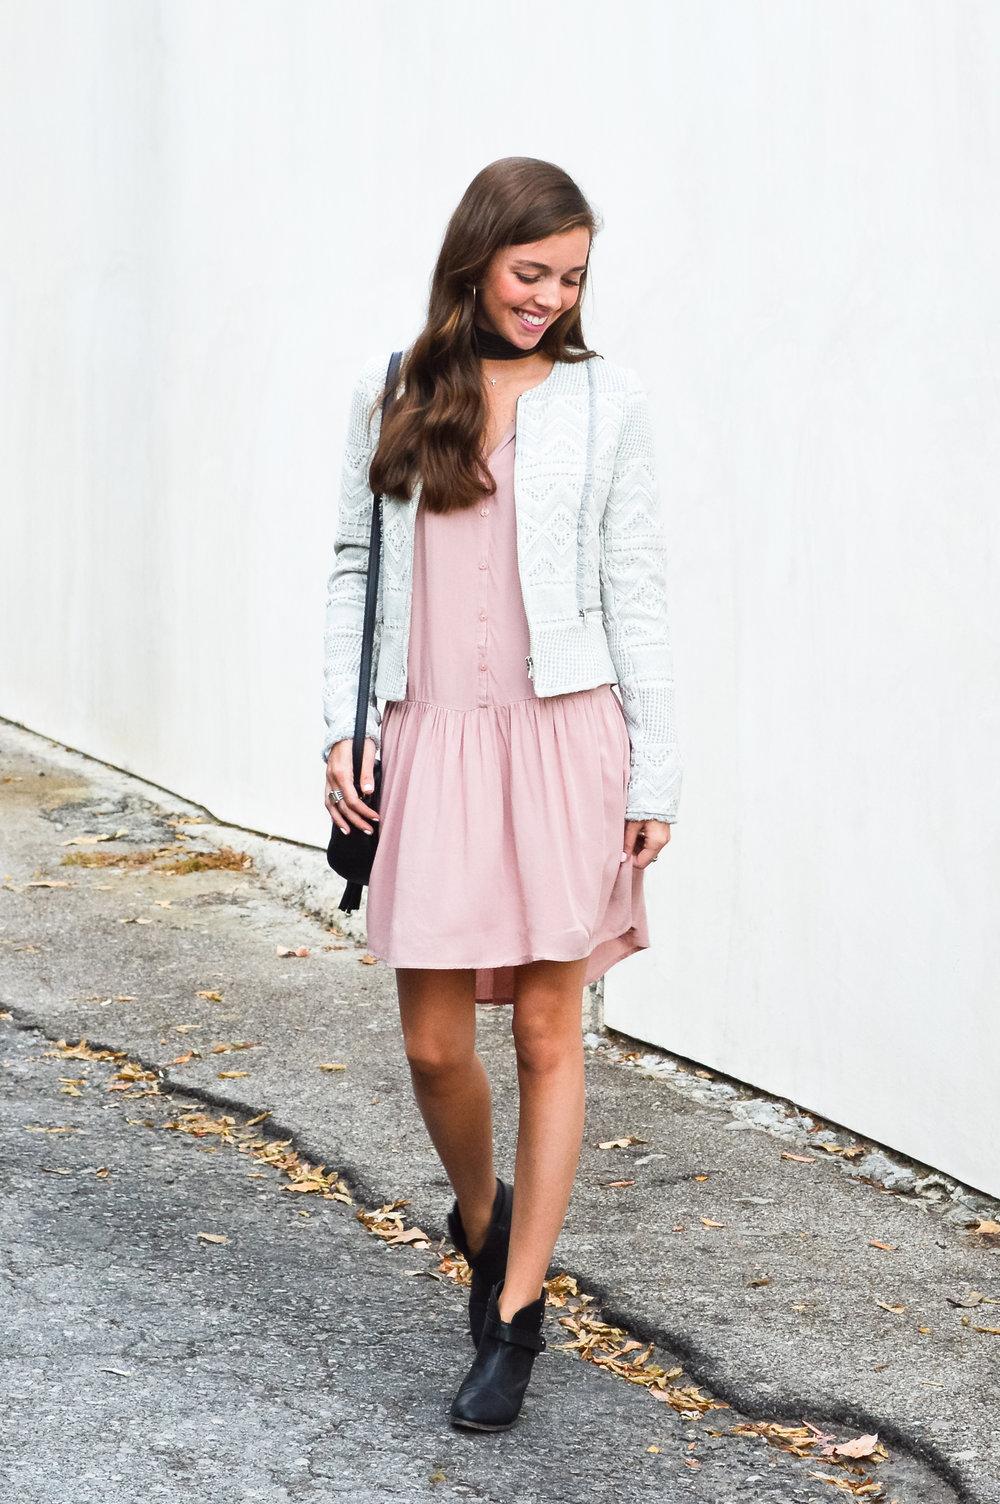 fashion blogger lcb style rag and bone booties fall fashion zara (19 of 23).jpg